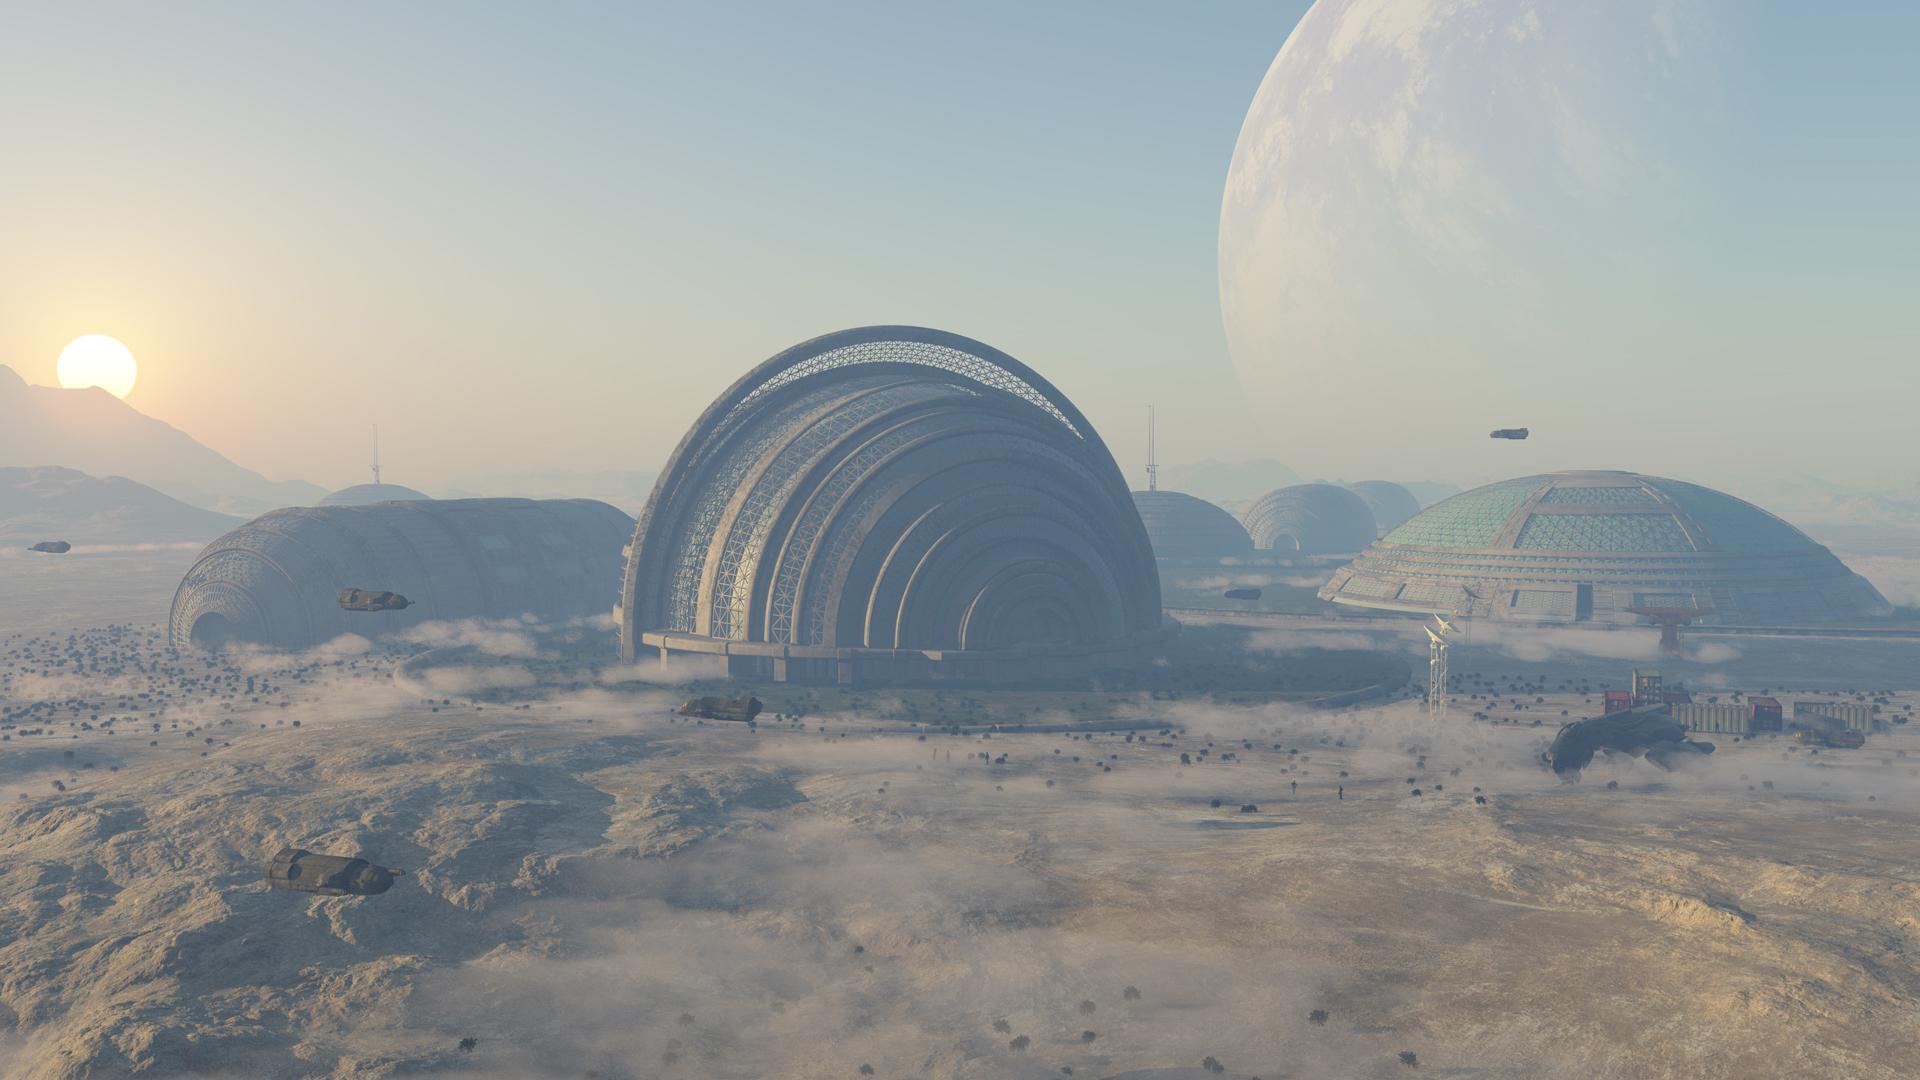 Immobilien auf dem Mars